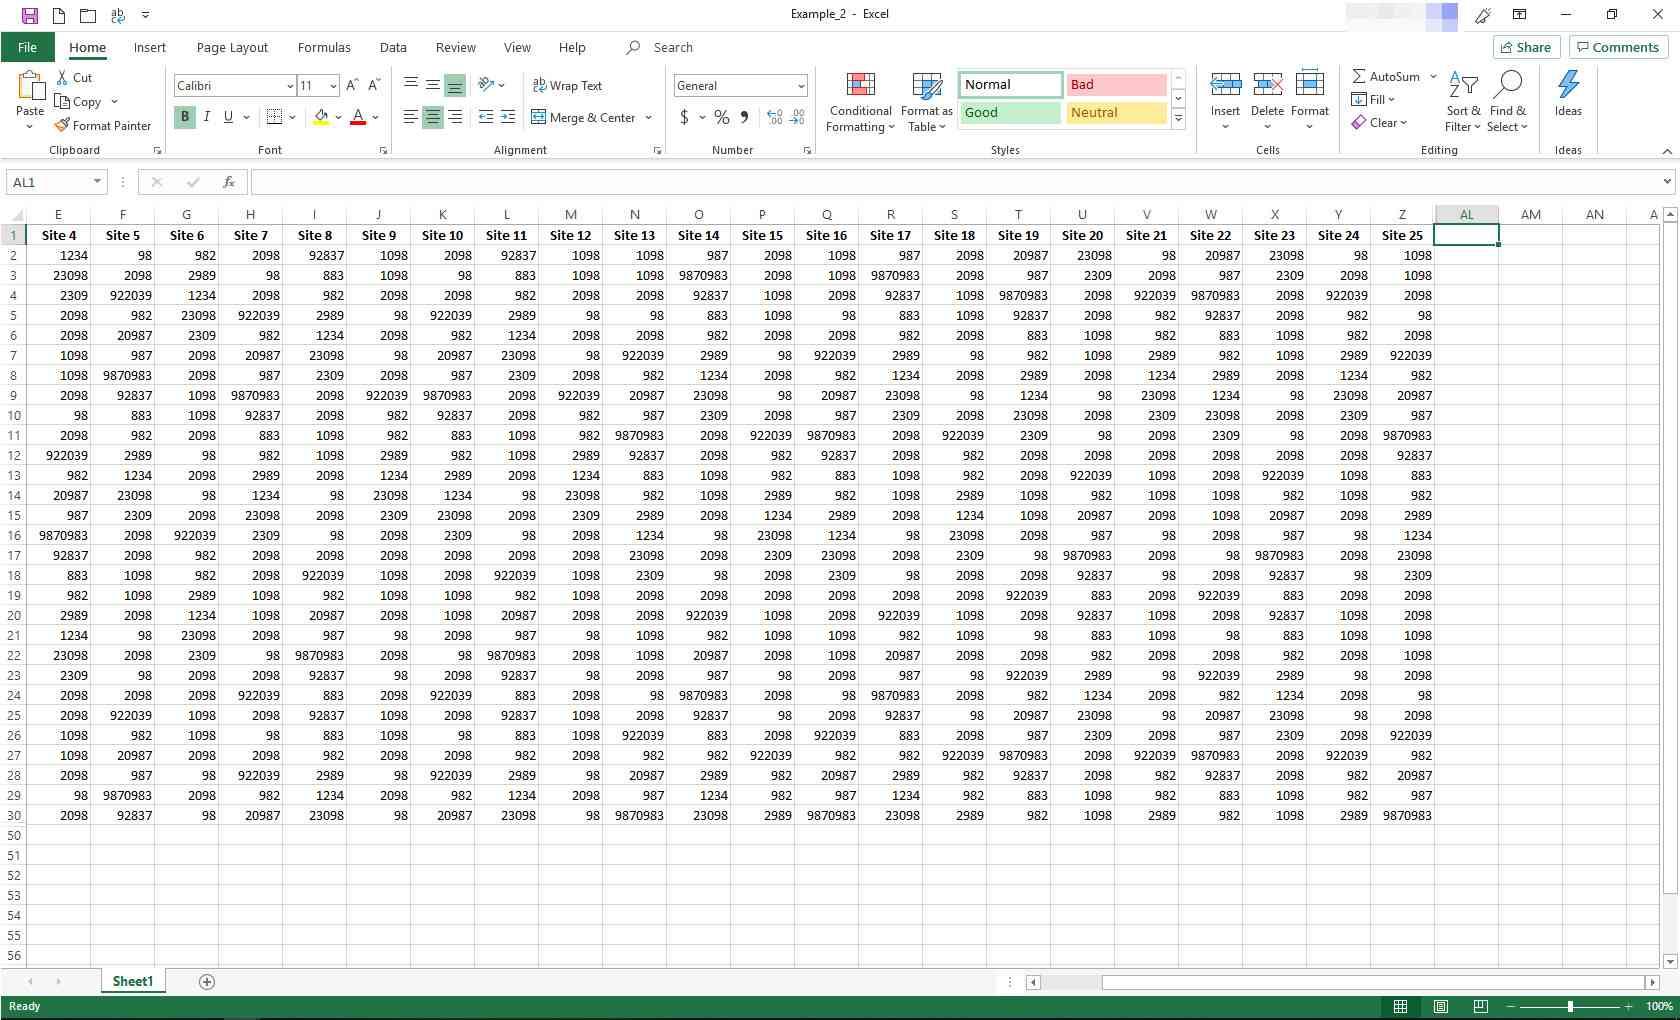 Excel worksheet with some columns hidden